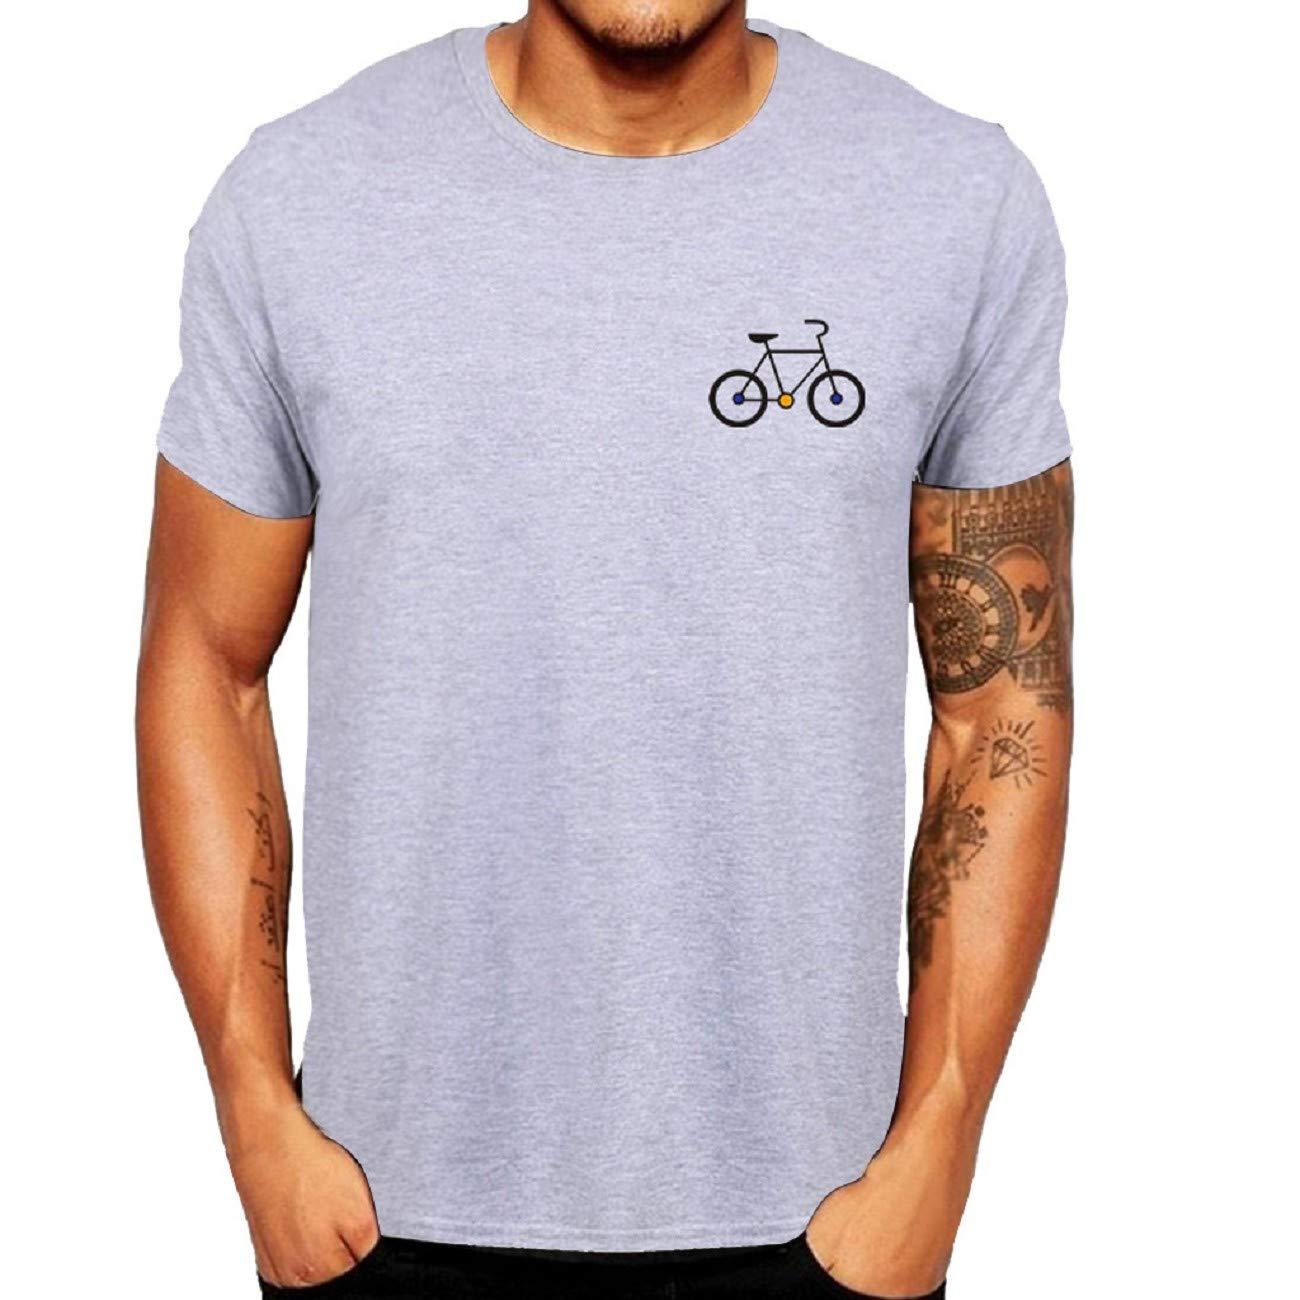 FAPIZI Mens Blouse Shirts Mens New Summer Cartoon Bicycle Patterns Printed T-Shirt Top Blouse Top